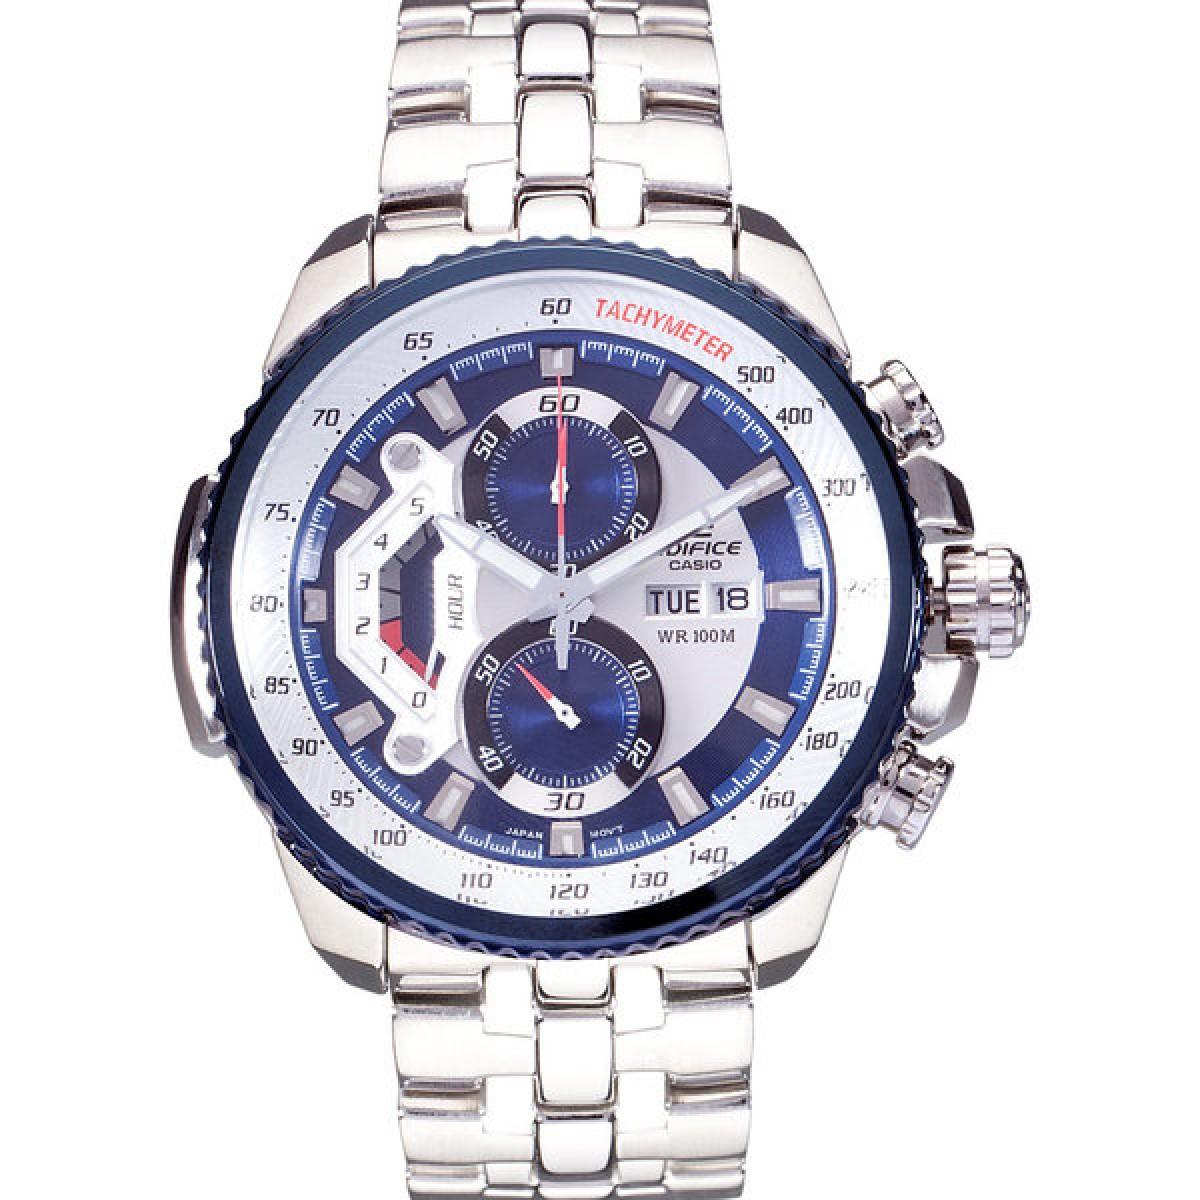 Casio Edifice Ef-558D-2Avdf SilverBlue Chronograph Watch c8d03bdb2e